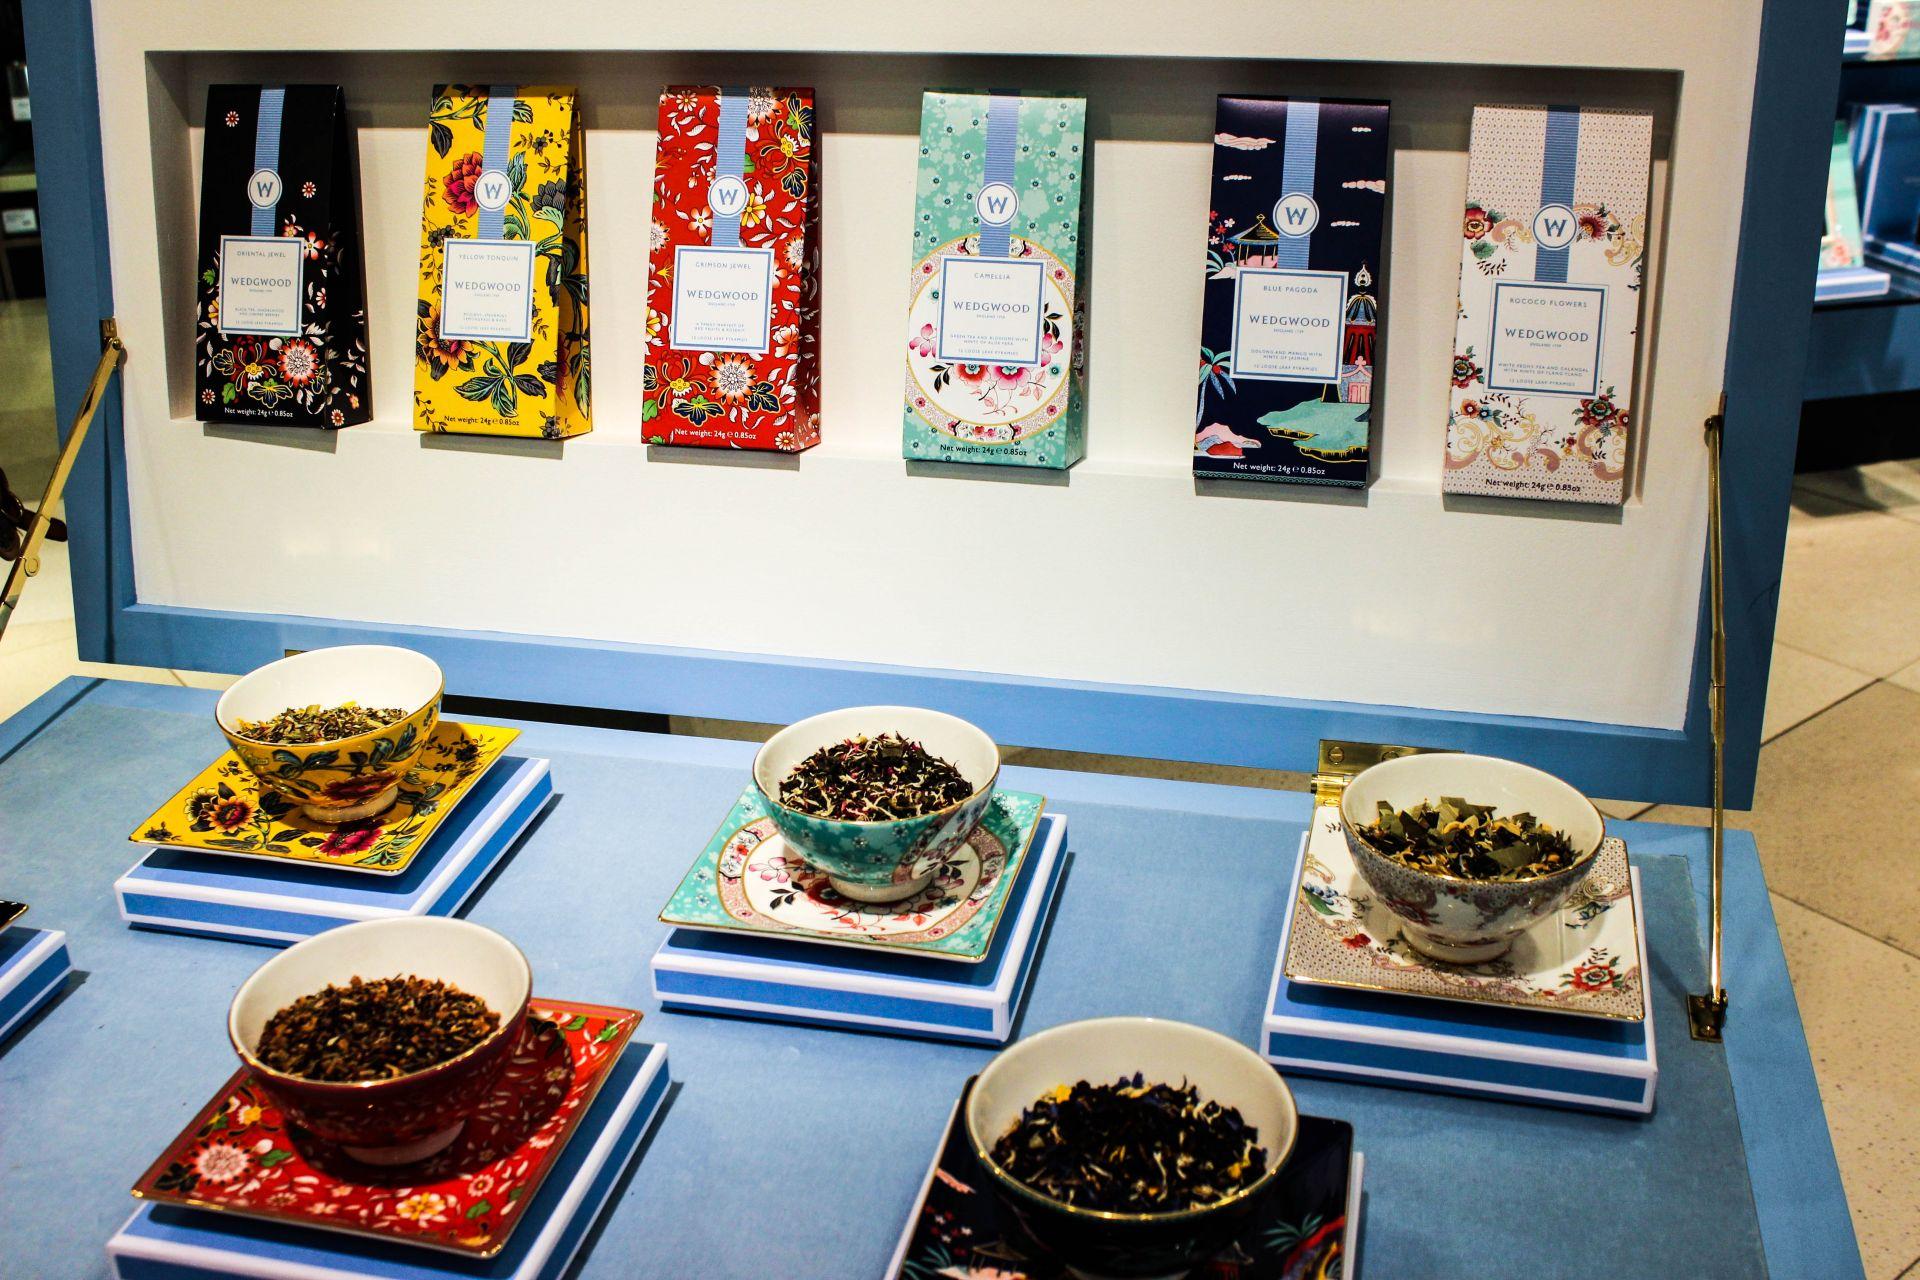 wedgwood tea conservatory john lewis